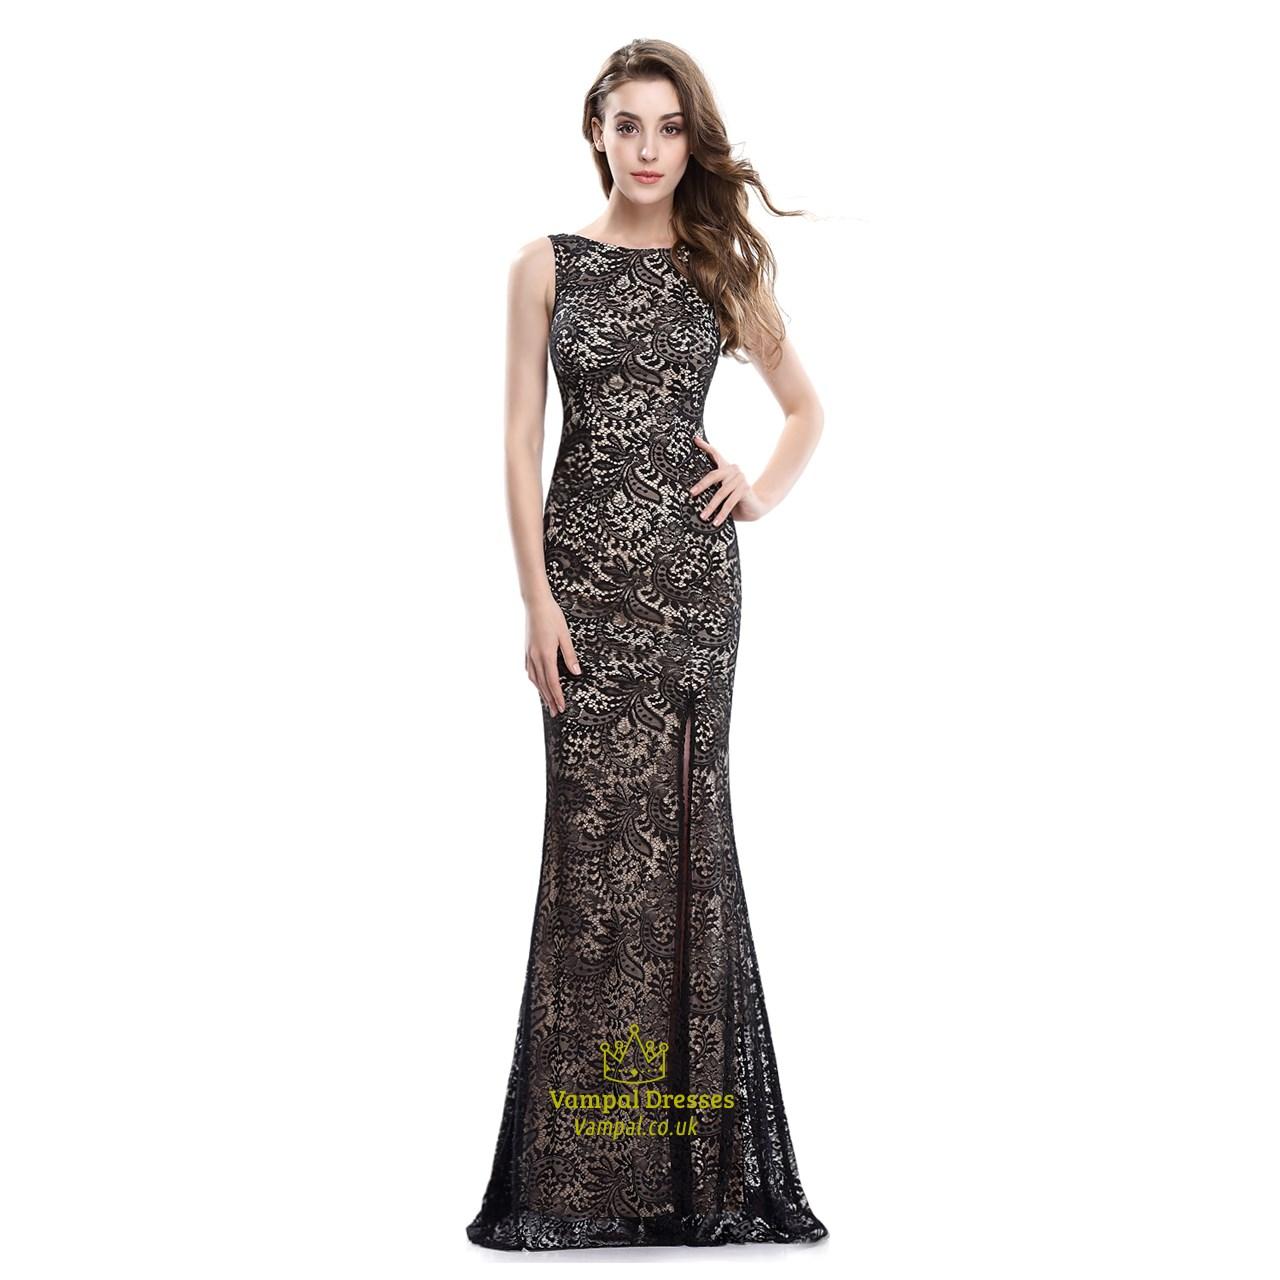 Black Champagne Dress